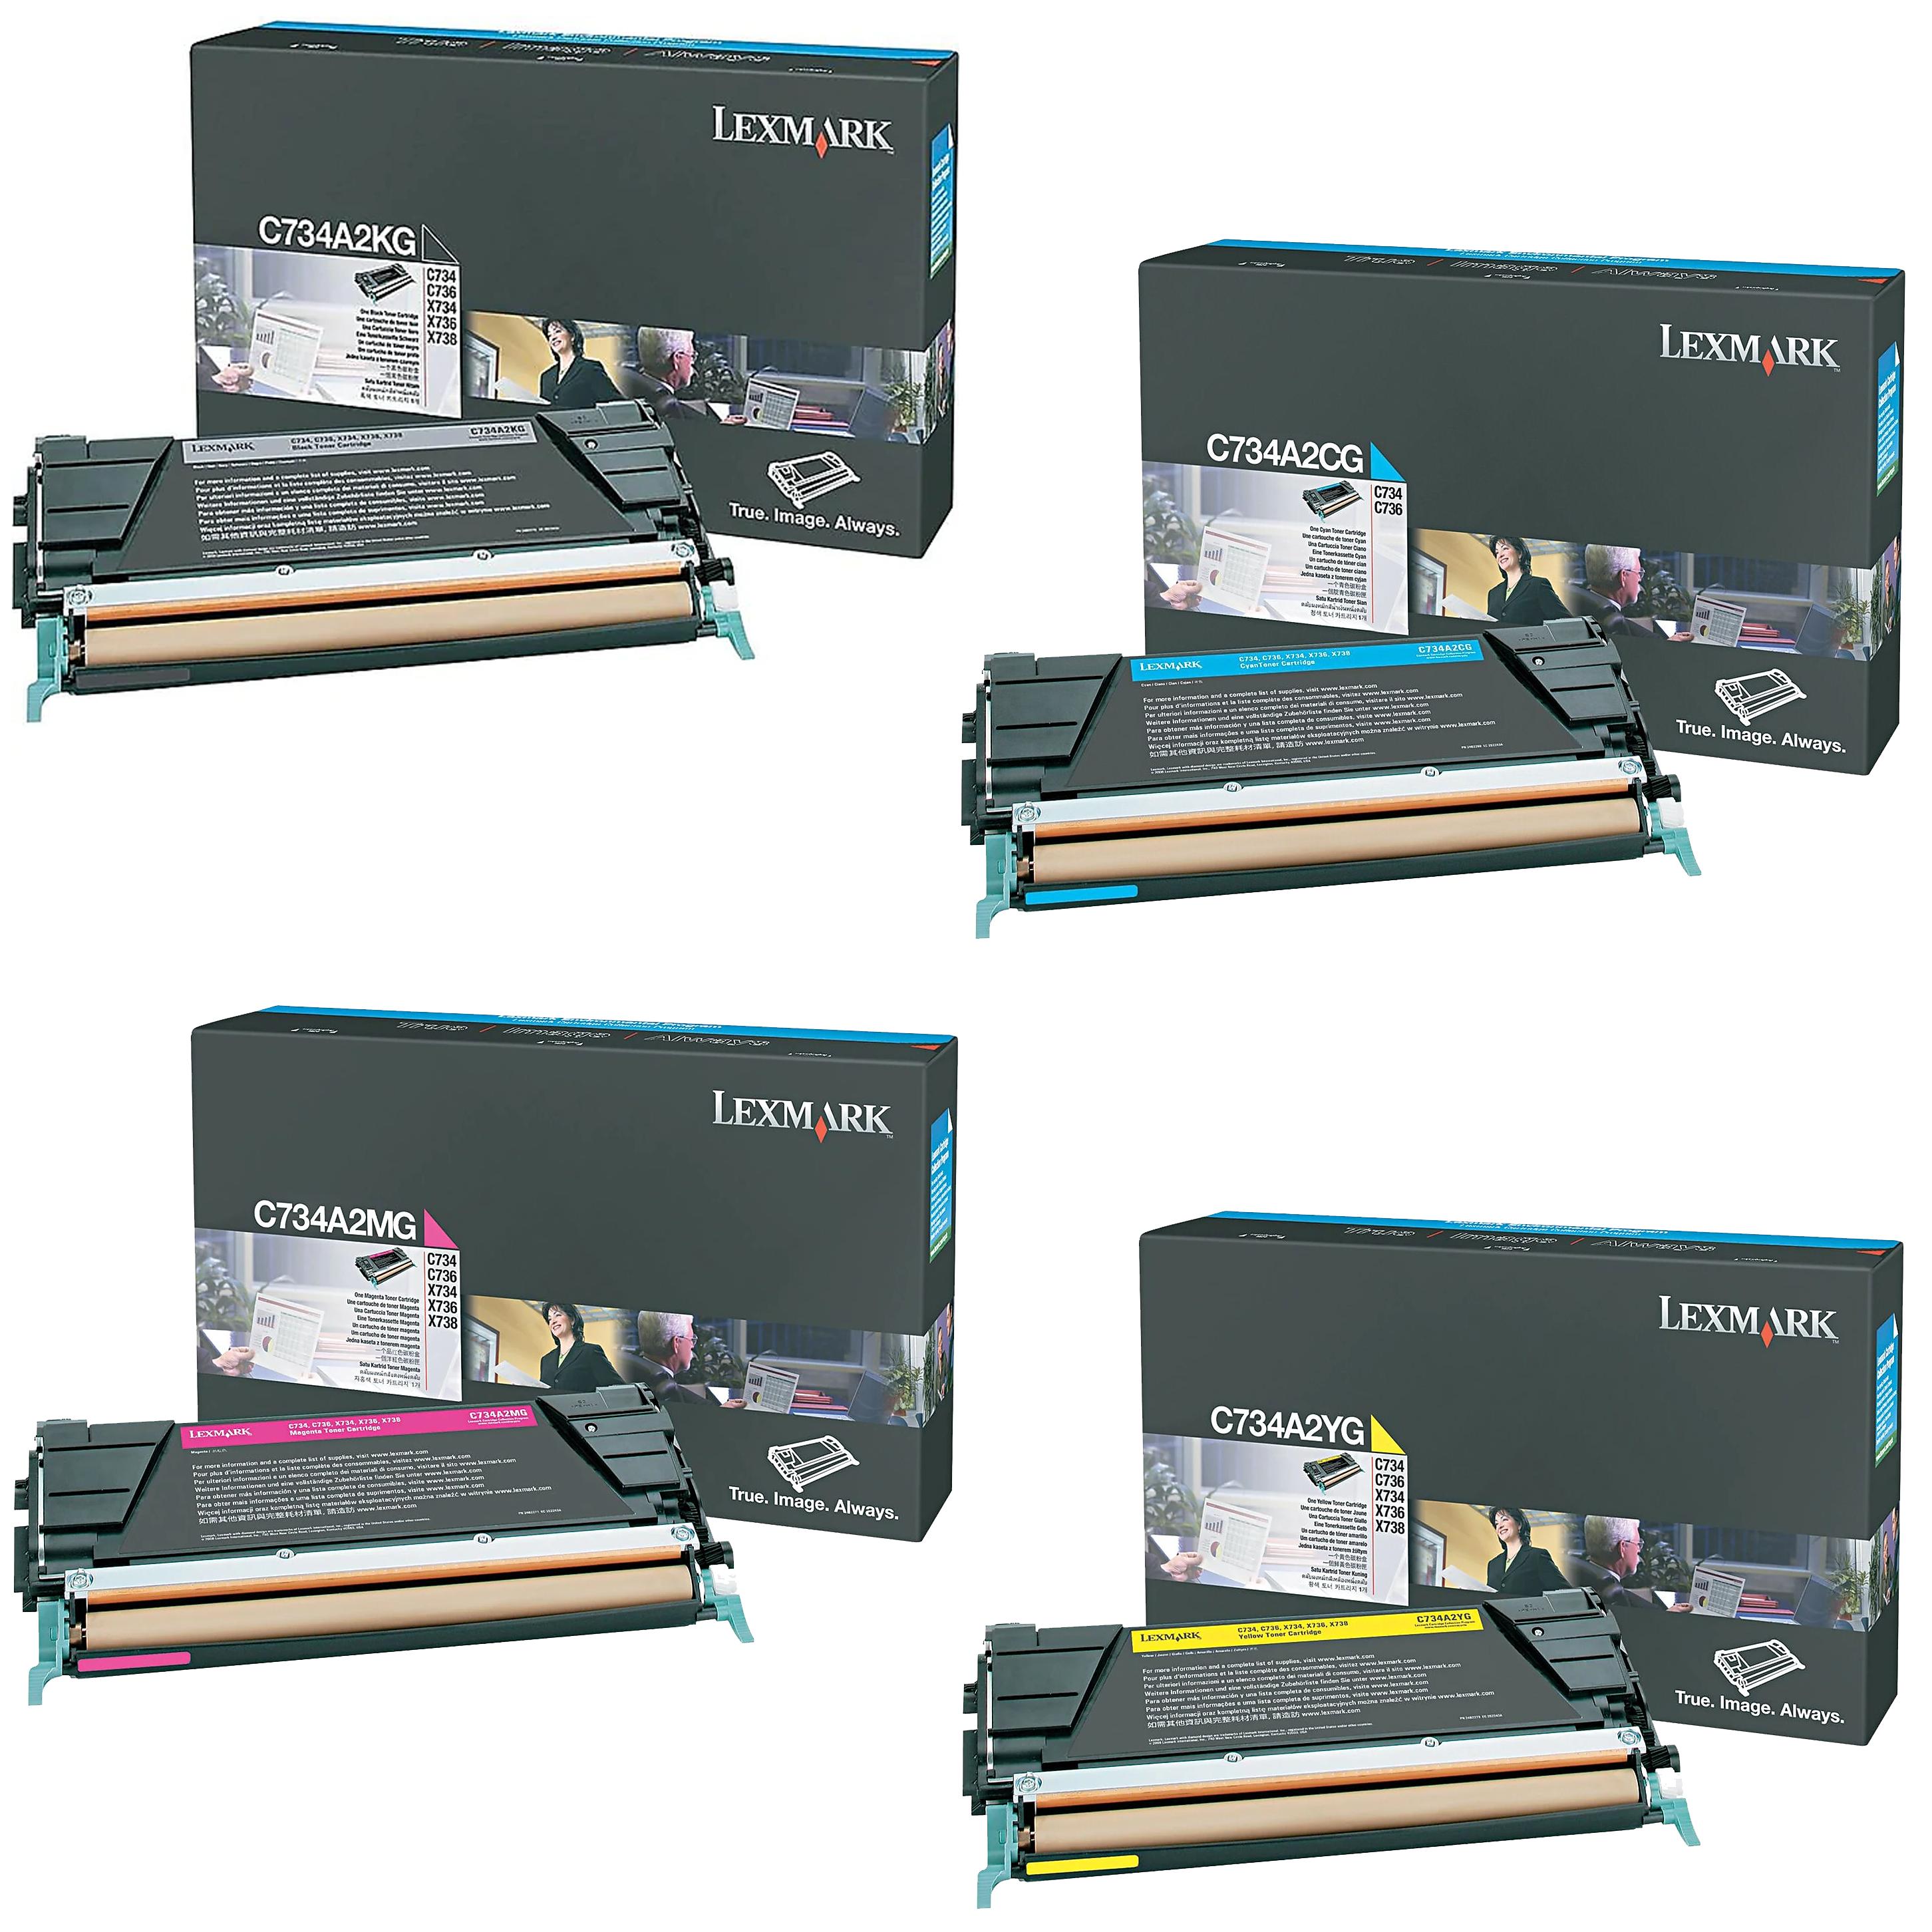 Lexmark C734A2 Set | C734A2CG C734A2KG C734A2MG C734A2YG | Original Lexmark Toner Cartridges – Black, Cyan, Magenta, Yellow